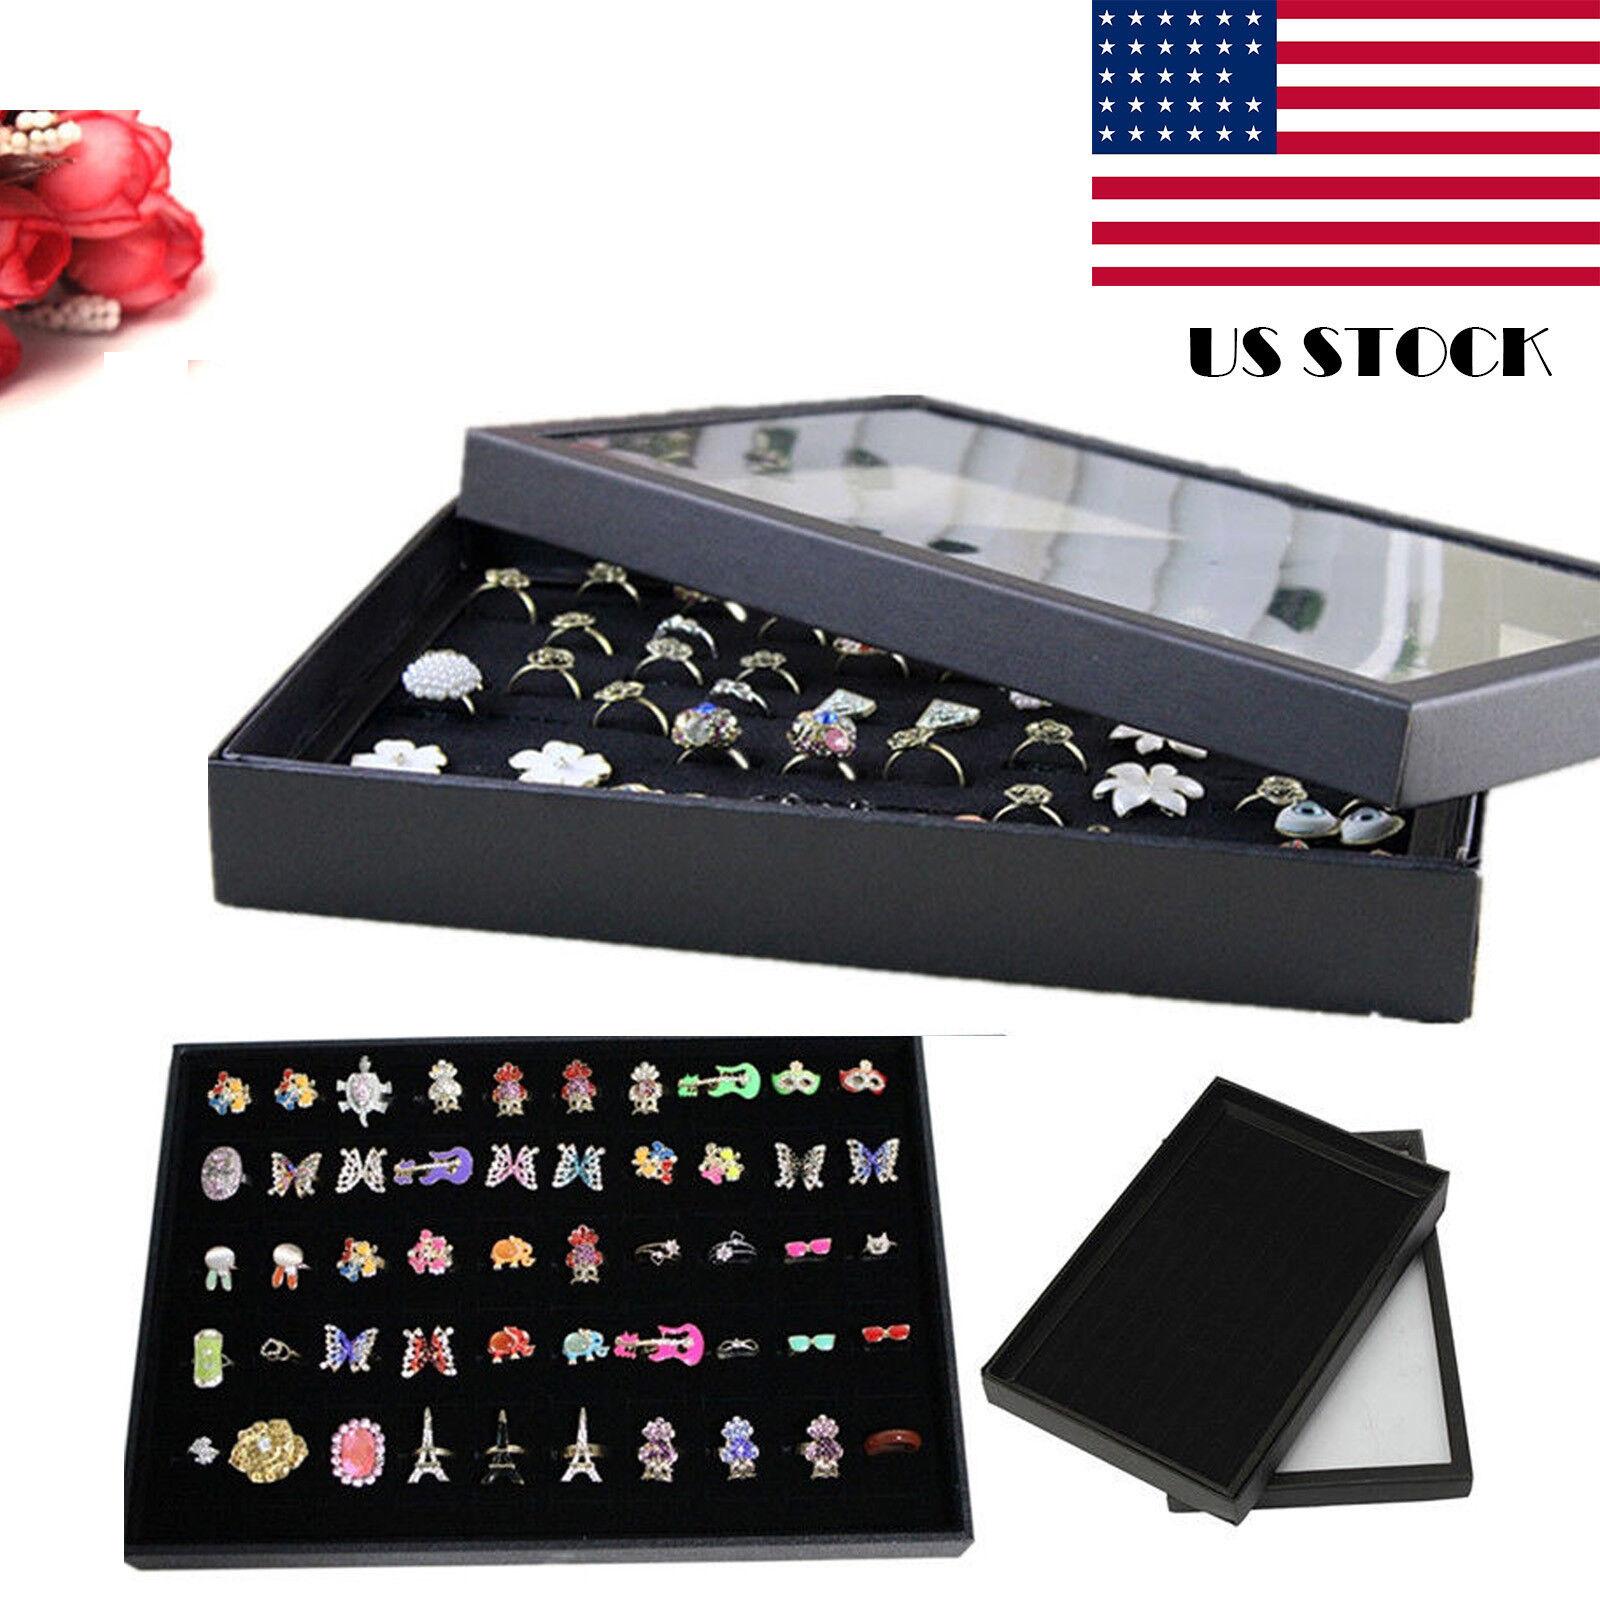 Jewelry - 100 Ring Jewellery Display Storage Box Tray Show Case Organiser Earring Holder